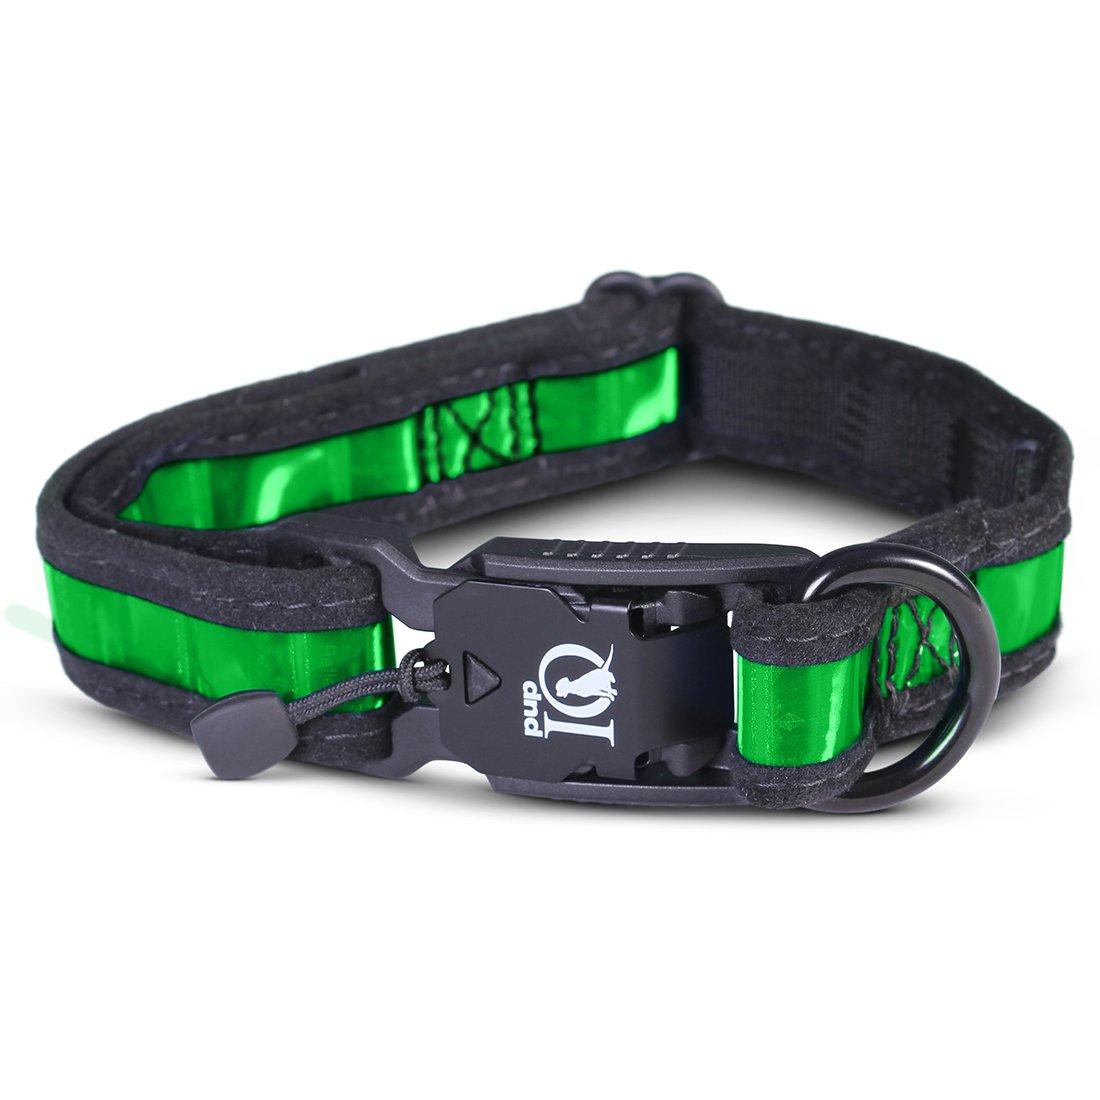 Green Medium Green Medium PUP IQ SmartPup Prisma Reflective Dog Collar, for Reflectivity and Durability, Green, Medium